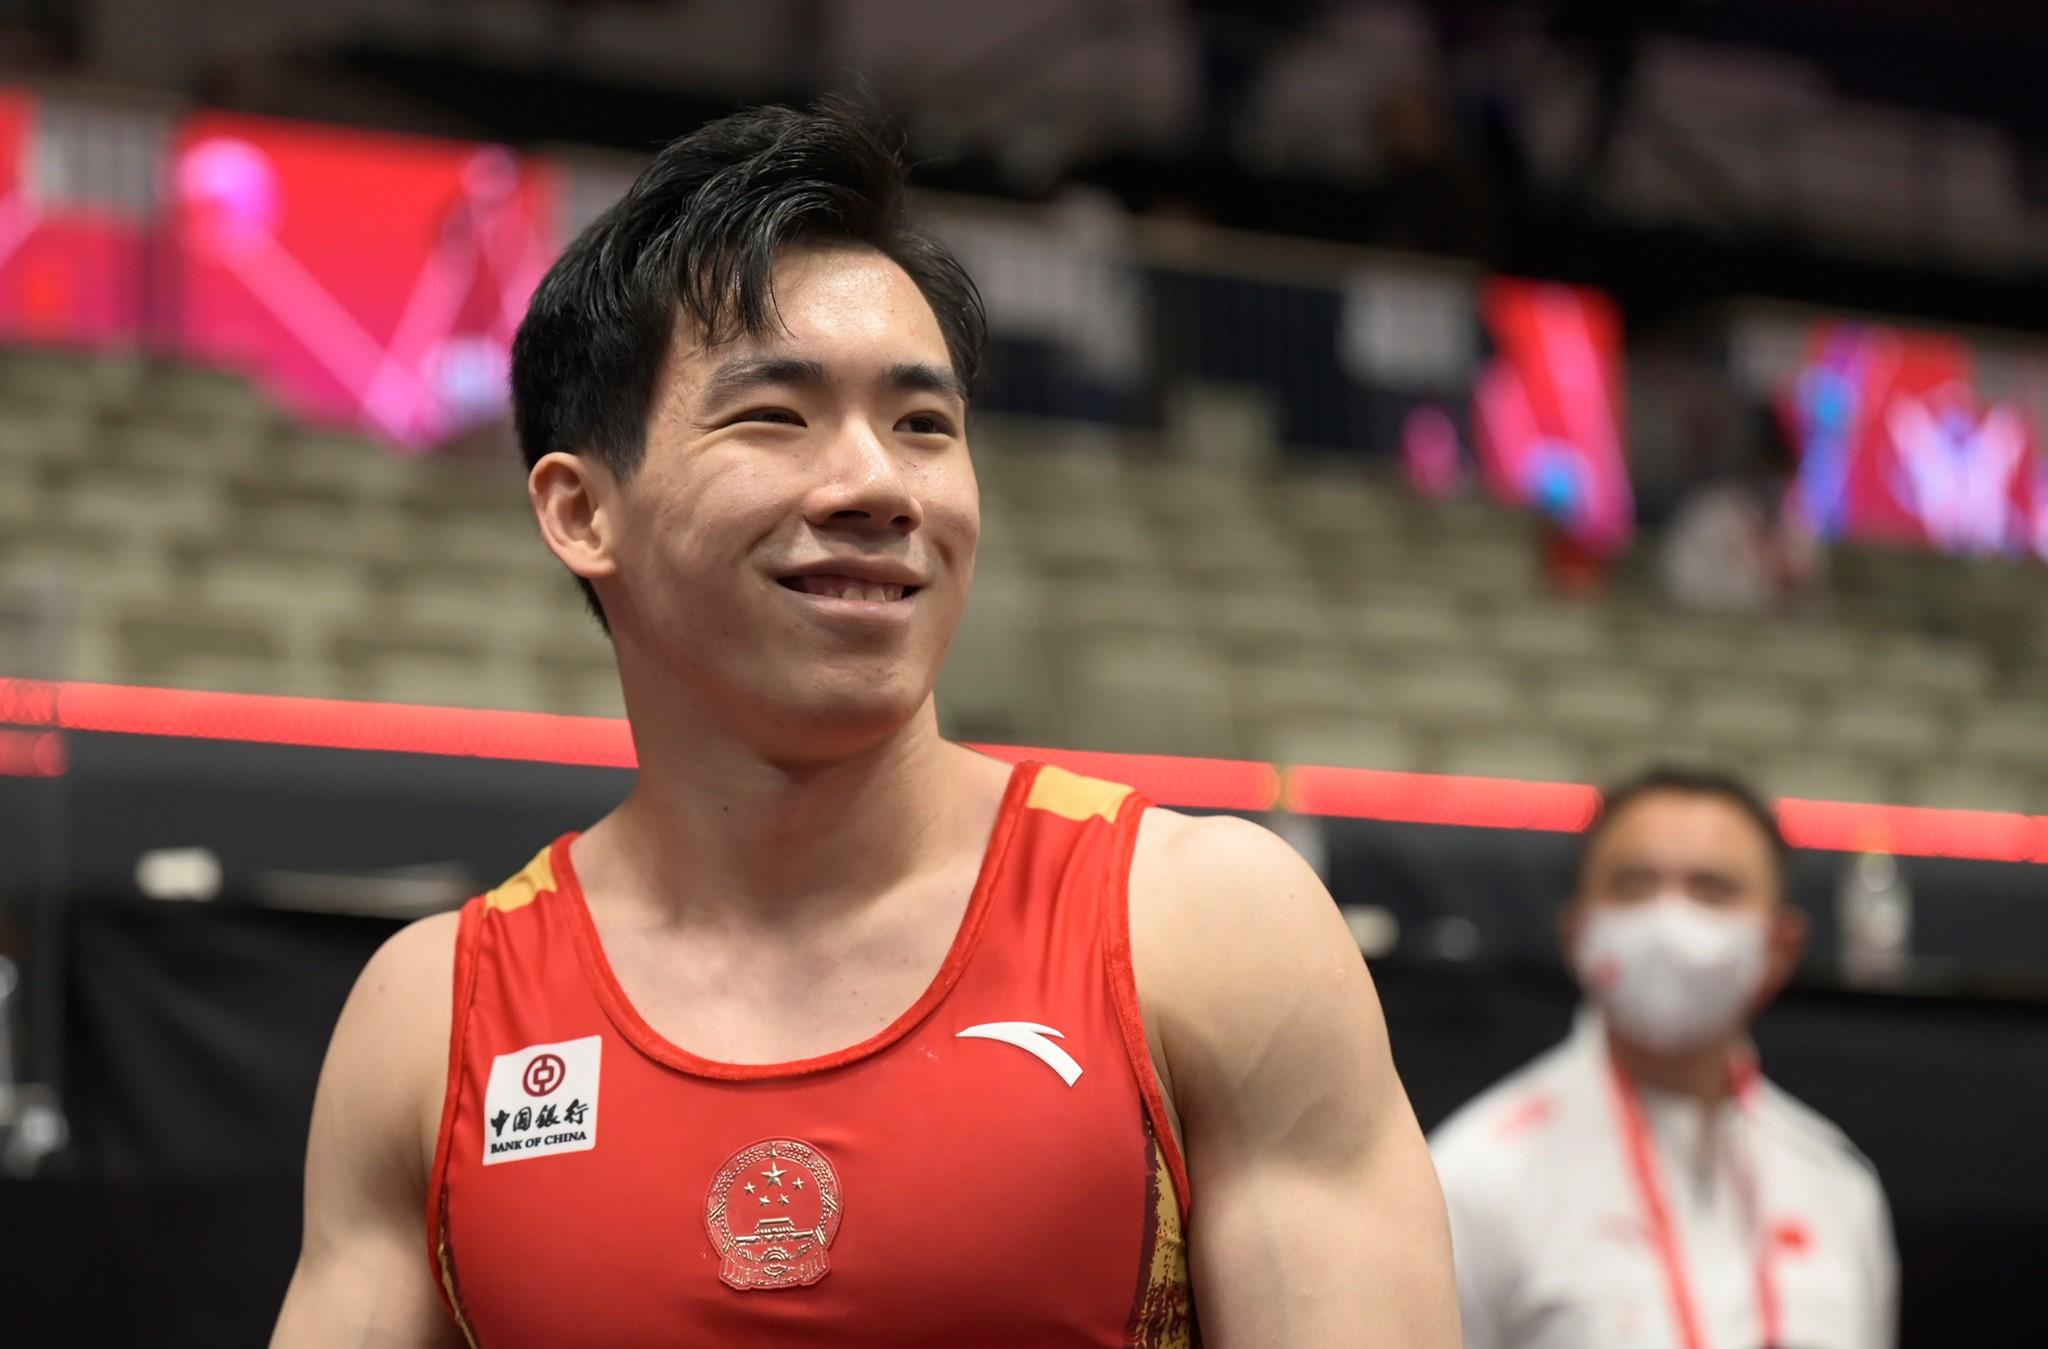 Mundial de Kitakyushu: final individual geral masculina